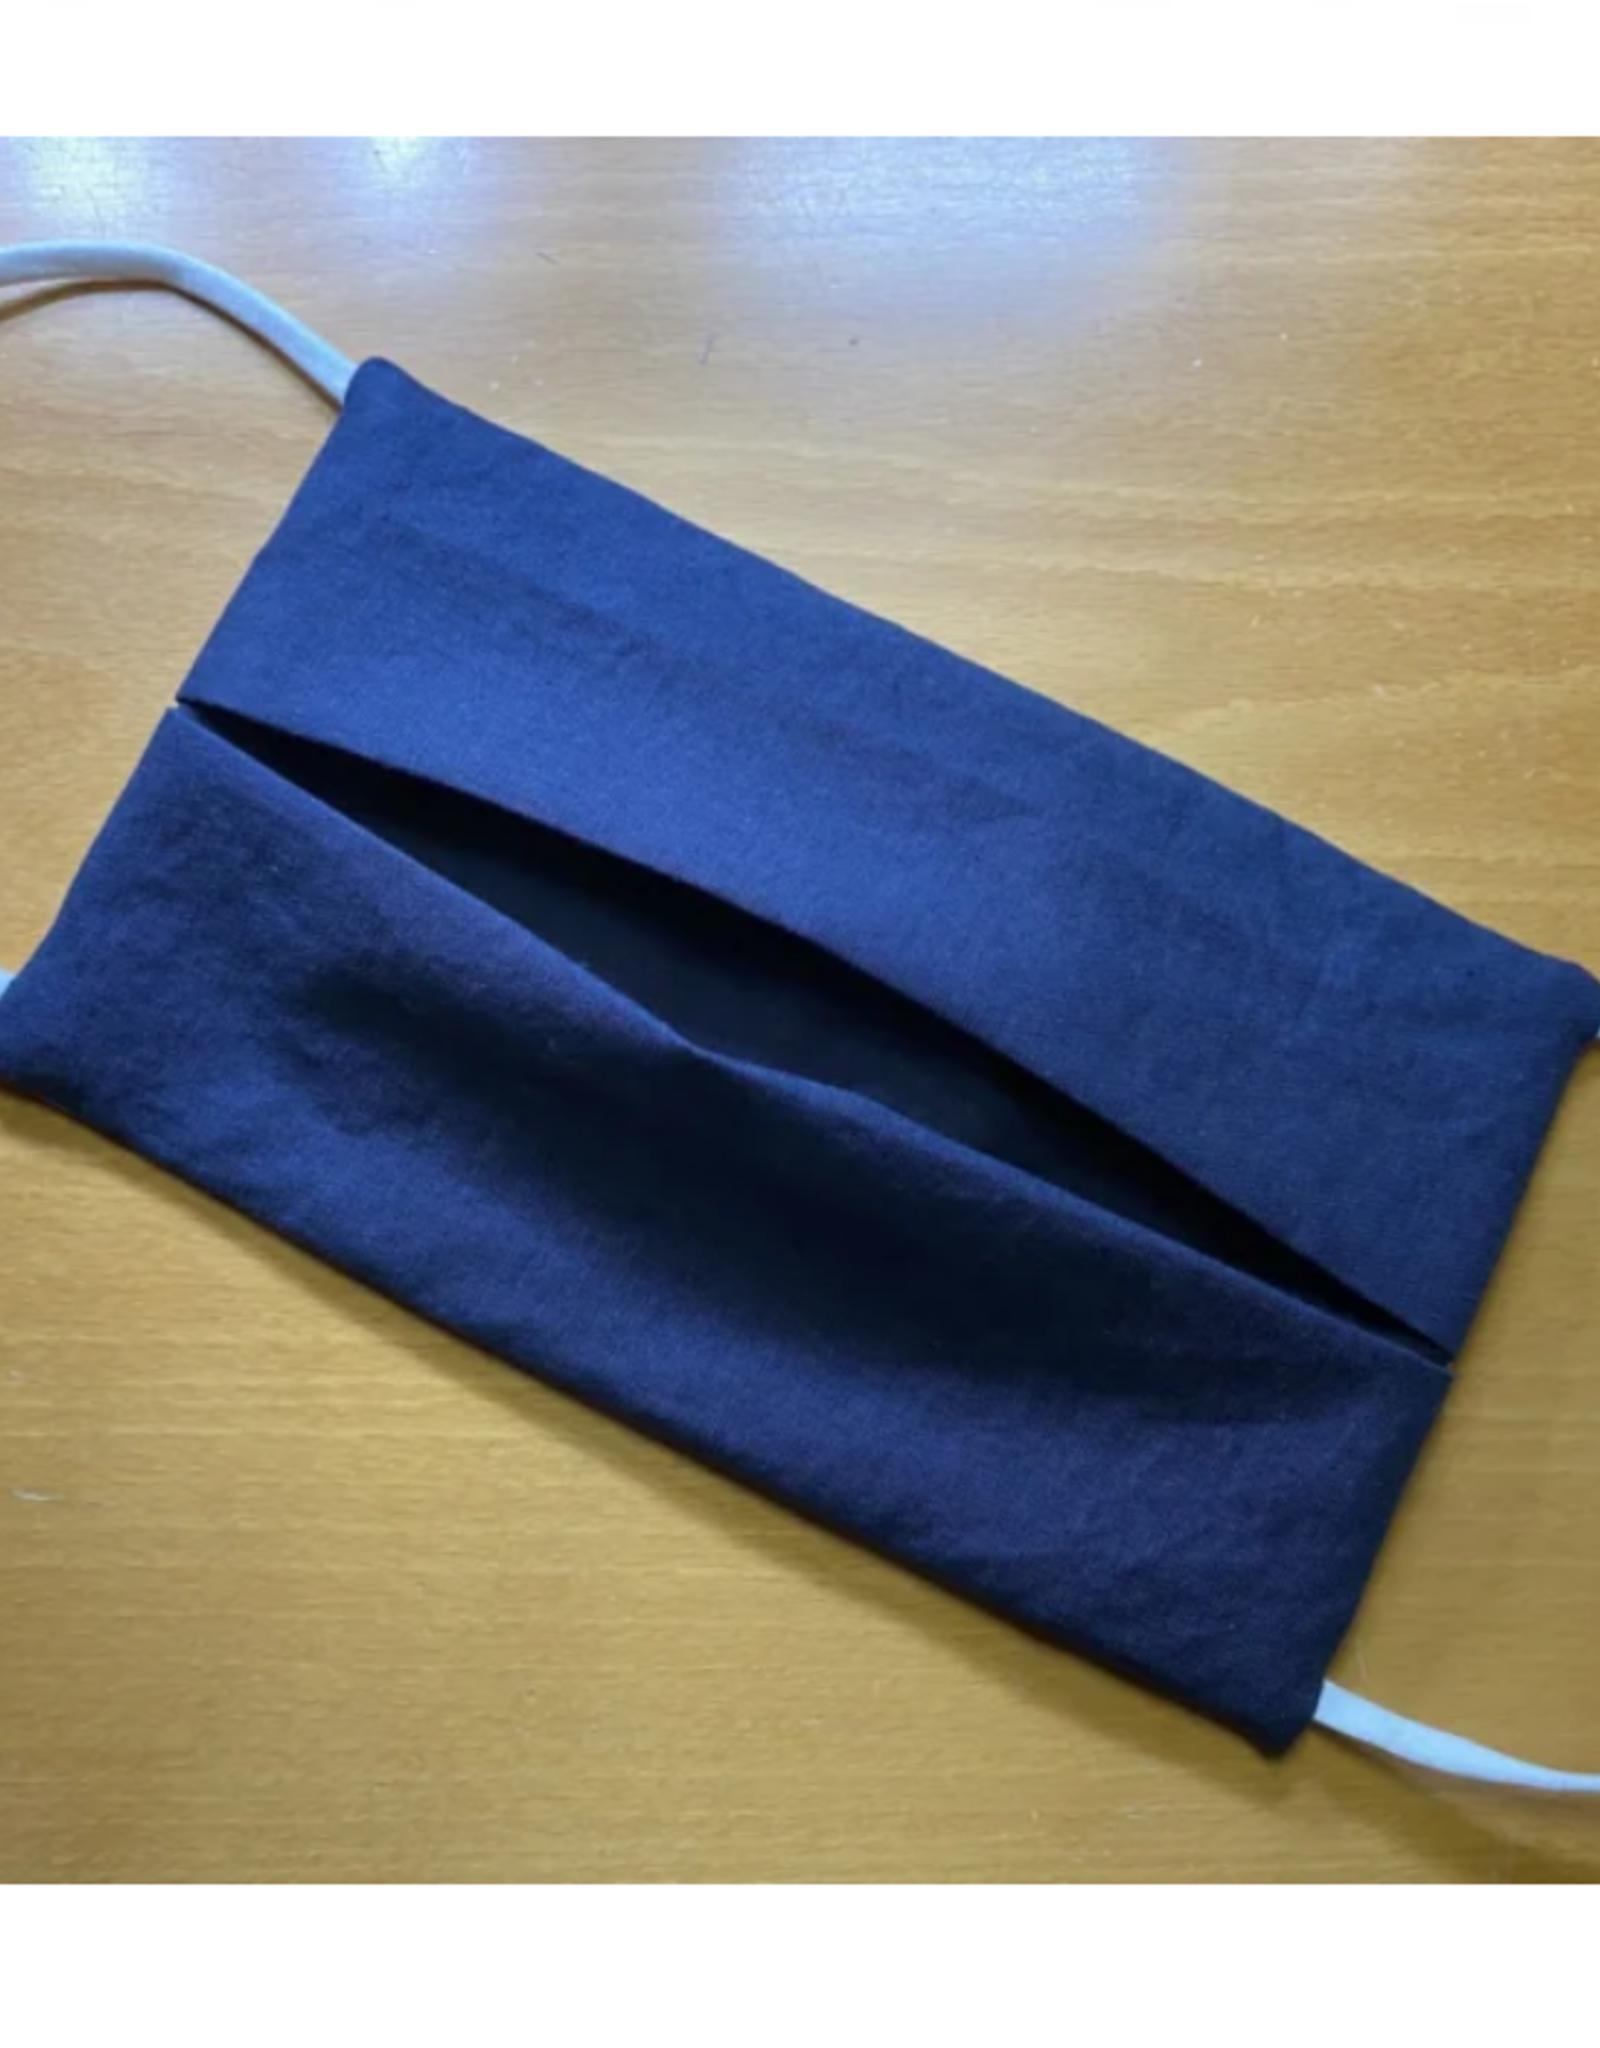 Mondmasker - Effen Marineblauw - Enveloppe